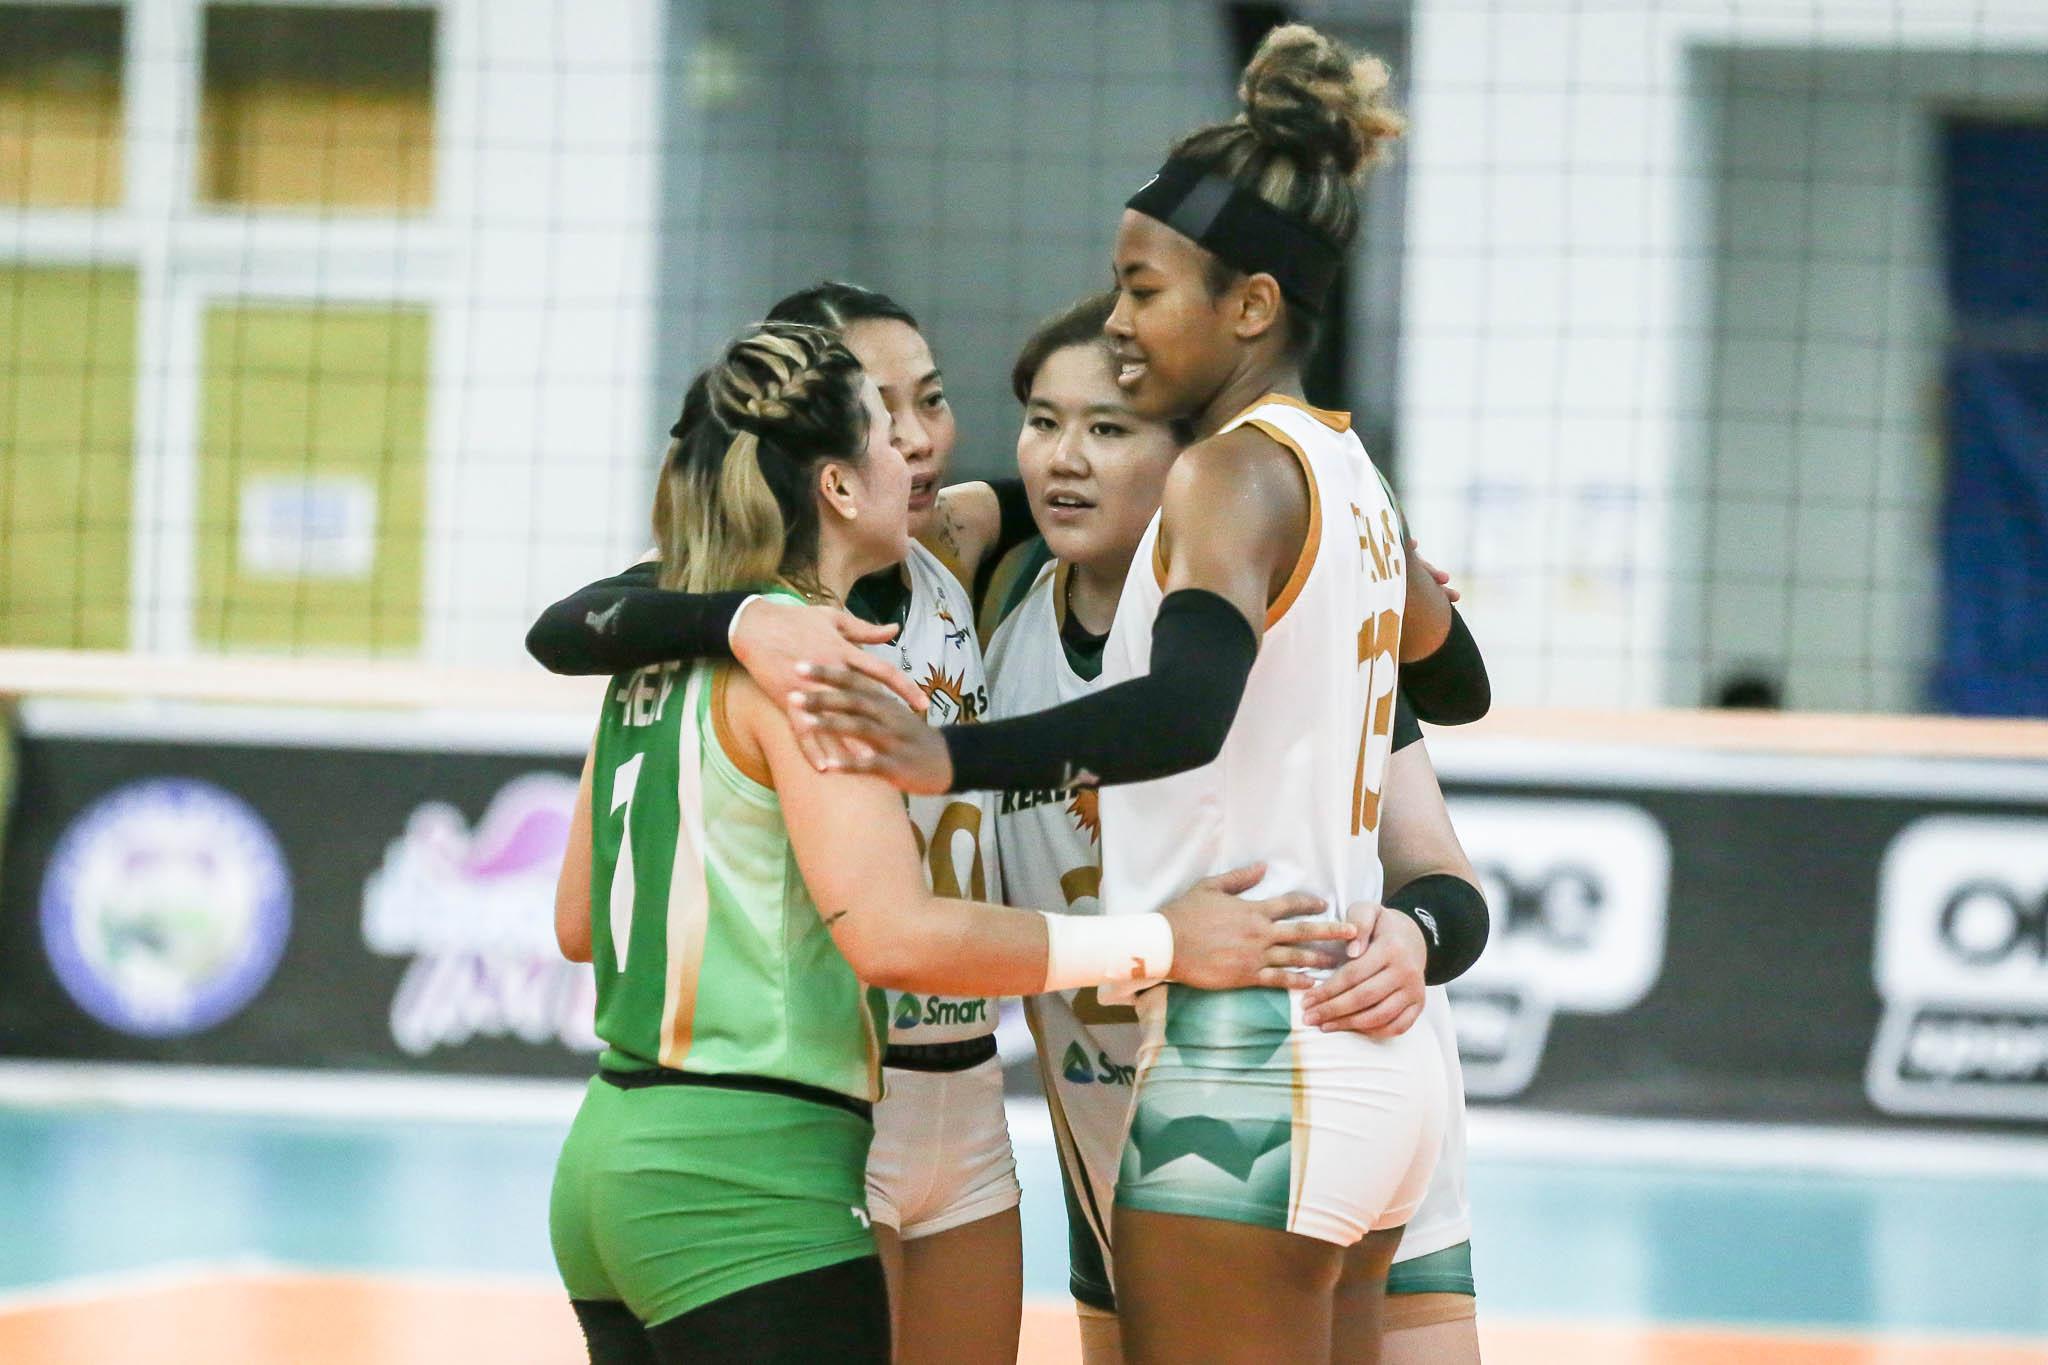 2021-PVL-Open-Chery-Tiggo-vs-Sta-Lucia-Bang-Pineda-x-Jonah-Sabete-x-Djanel-Cheng-x-MJ-Phillips Sta. Lucia treating each game like a championship match, says Phillips News PVL Volleyball  - philippine sports news